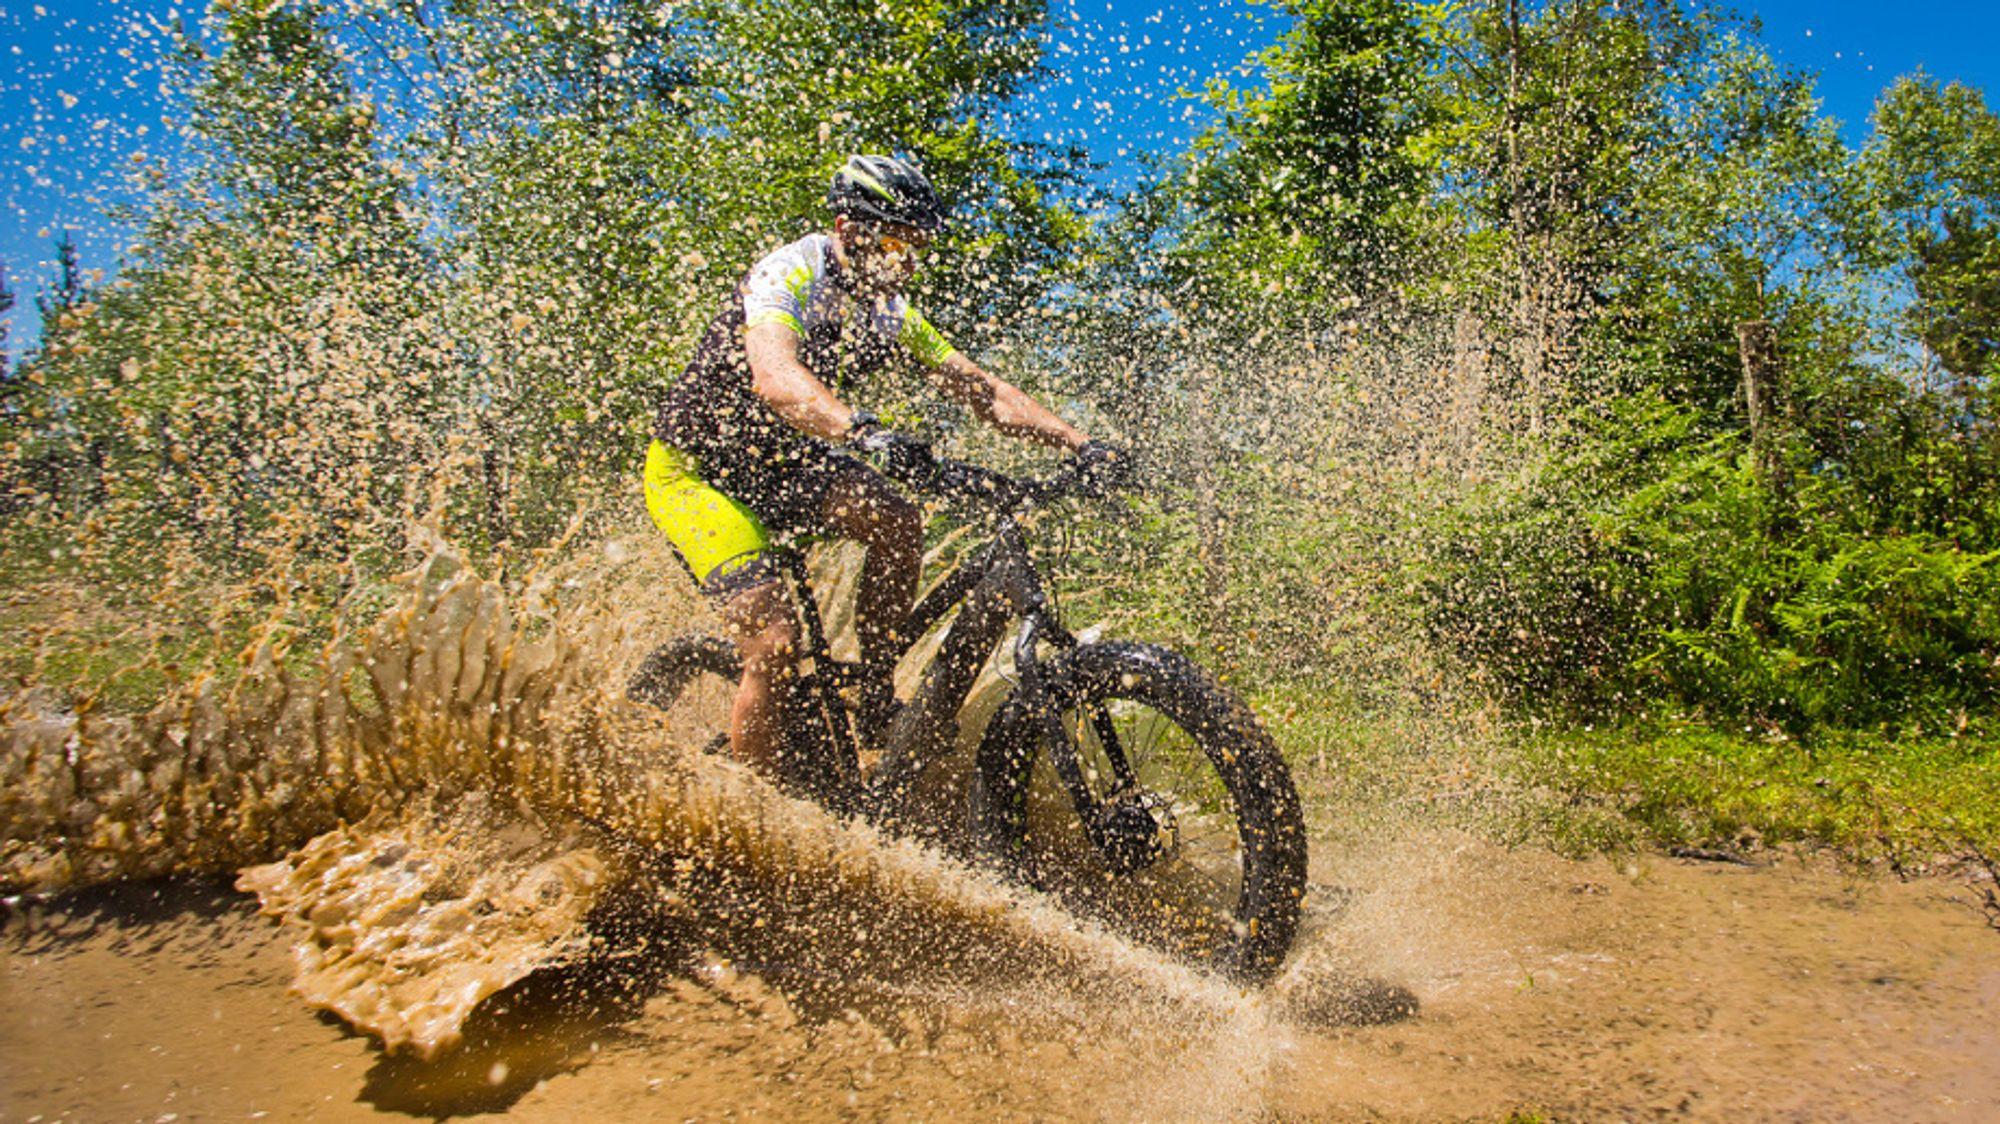 Miljødirektoratet har anbefalt at elsyklister skal få kjøre på turveger i utmark.